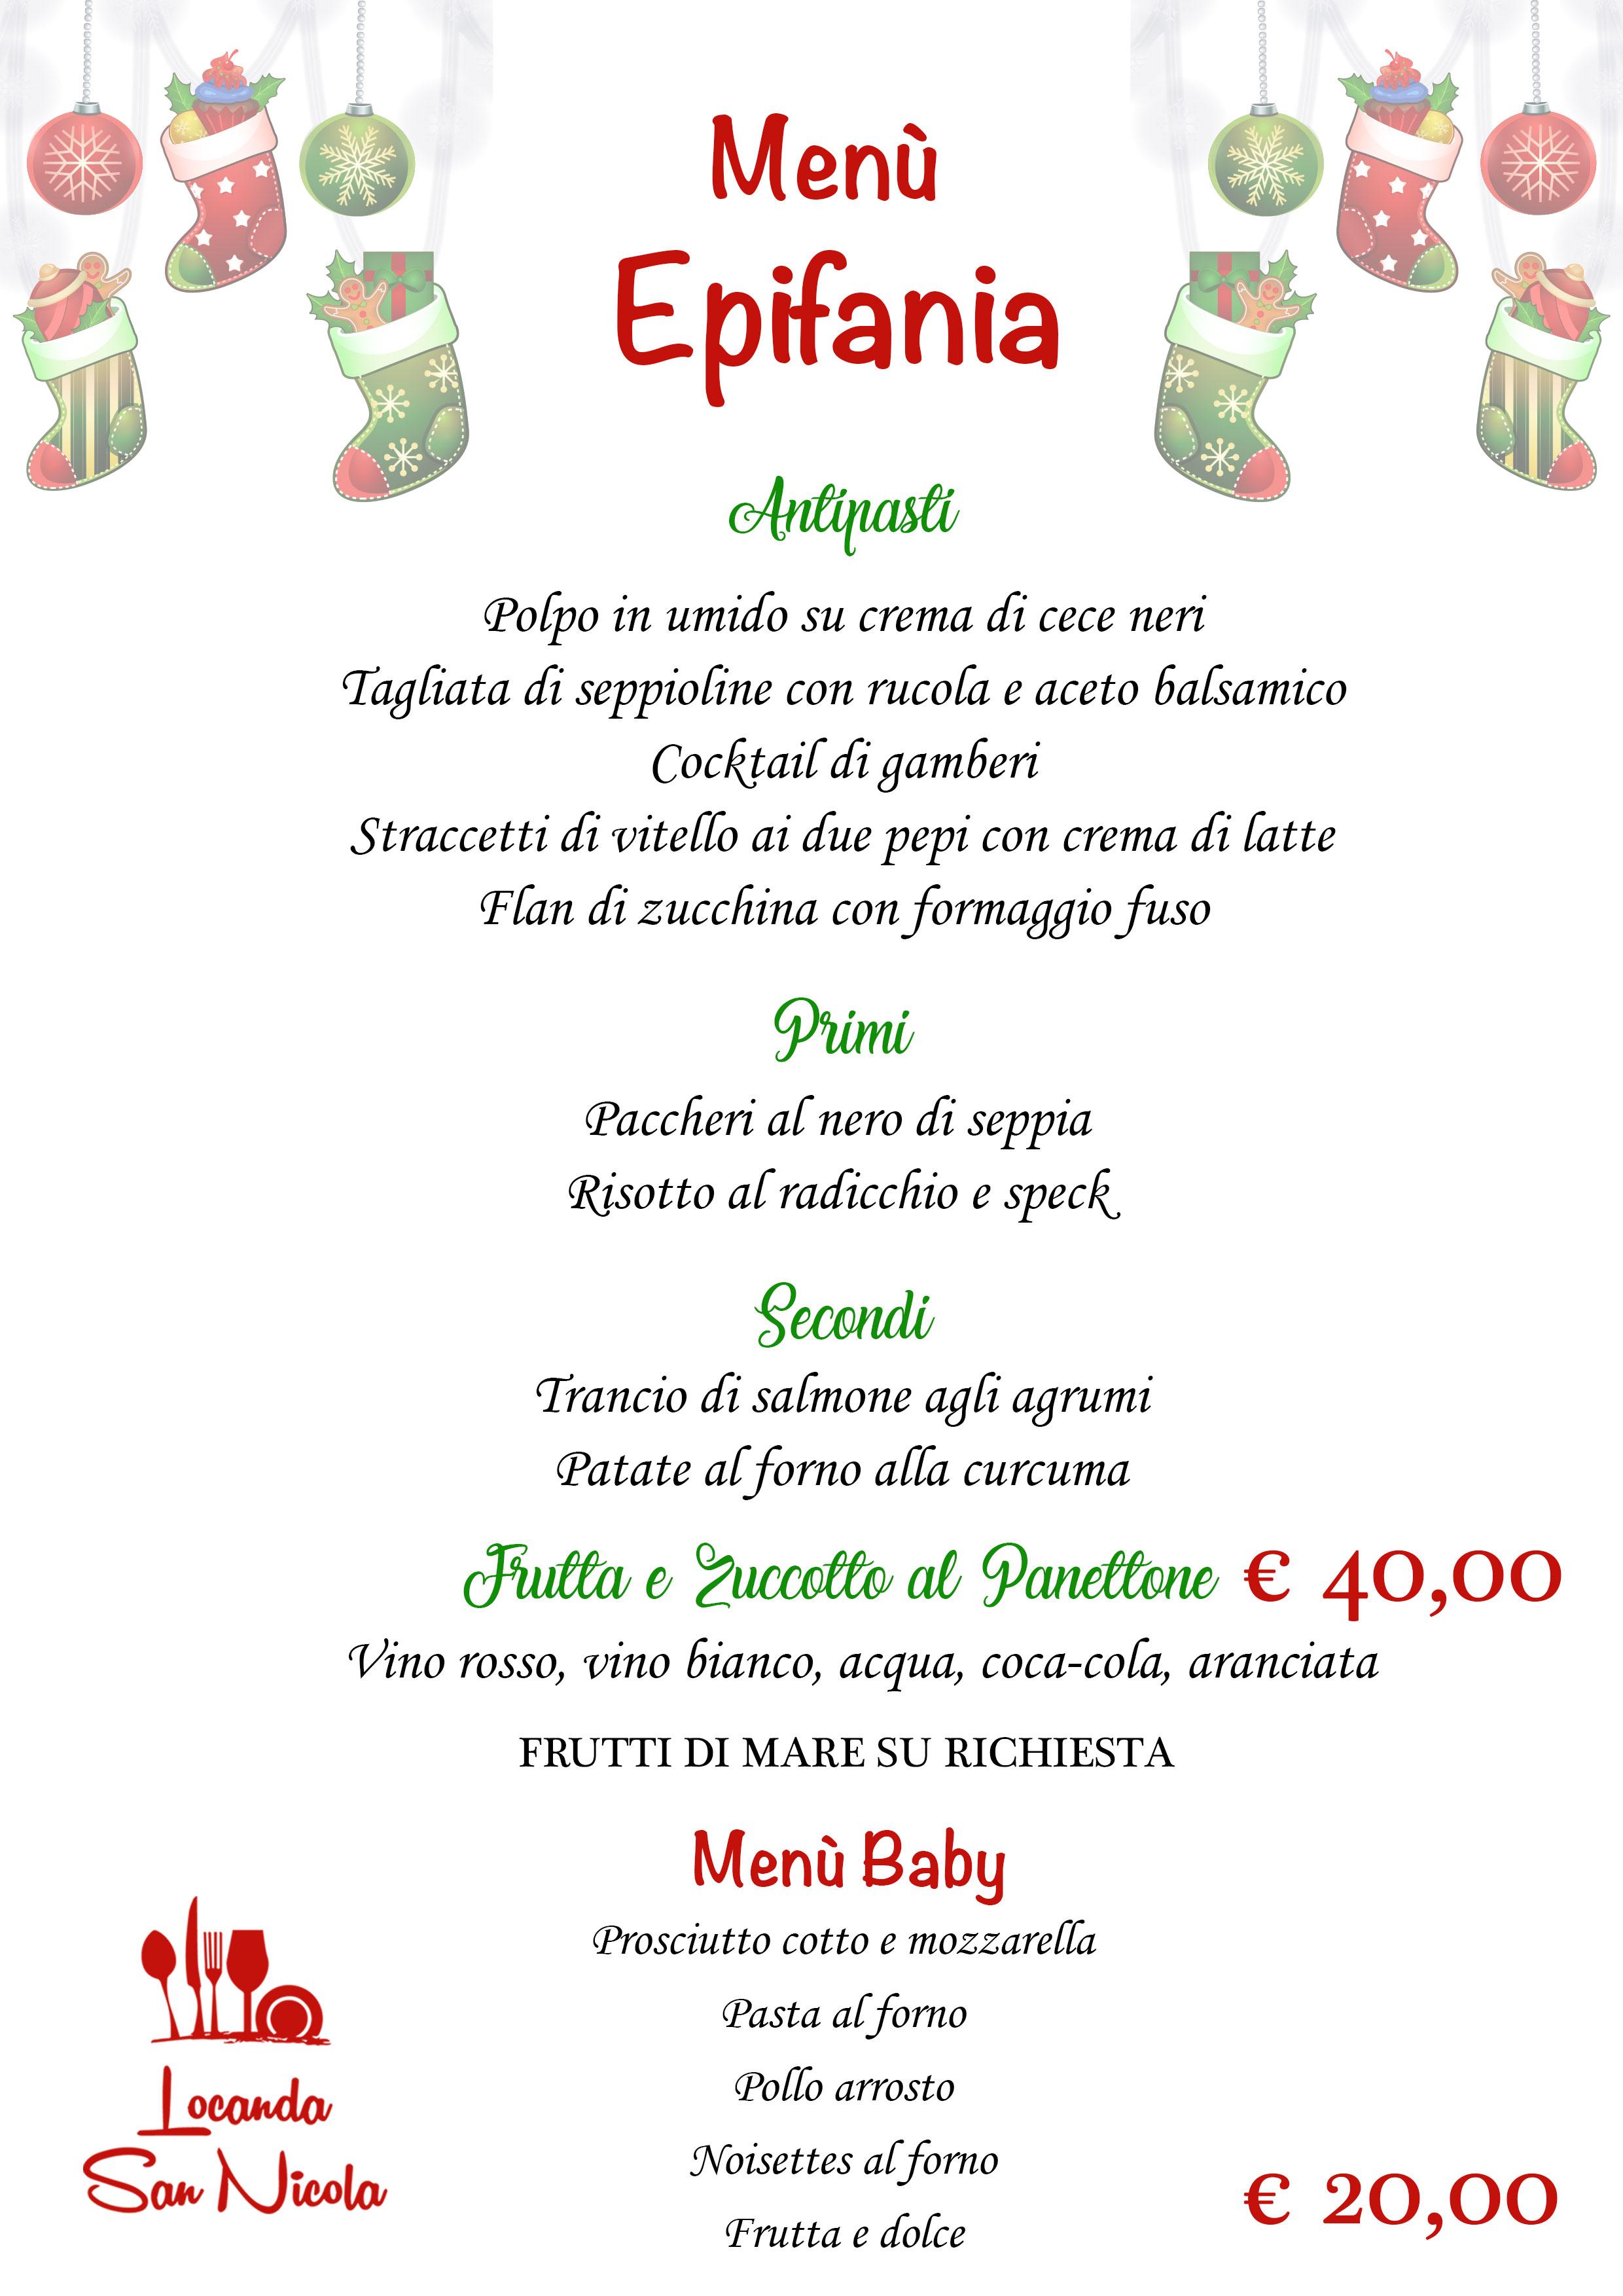 menu-epifania1